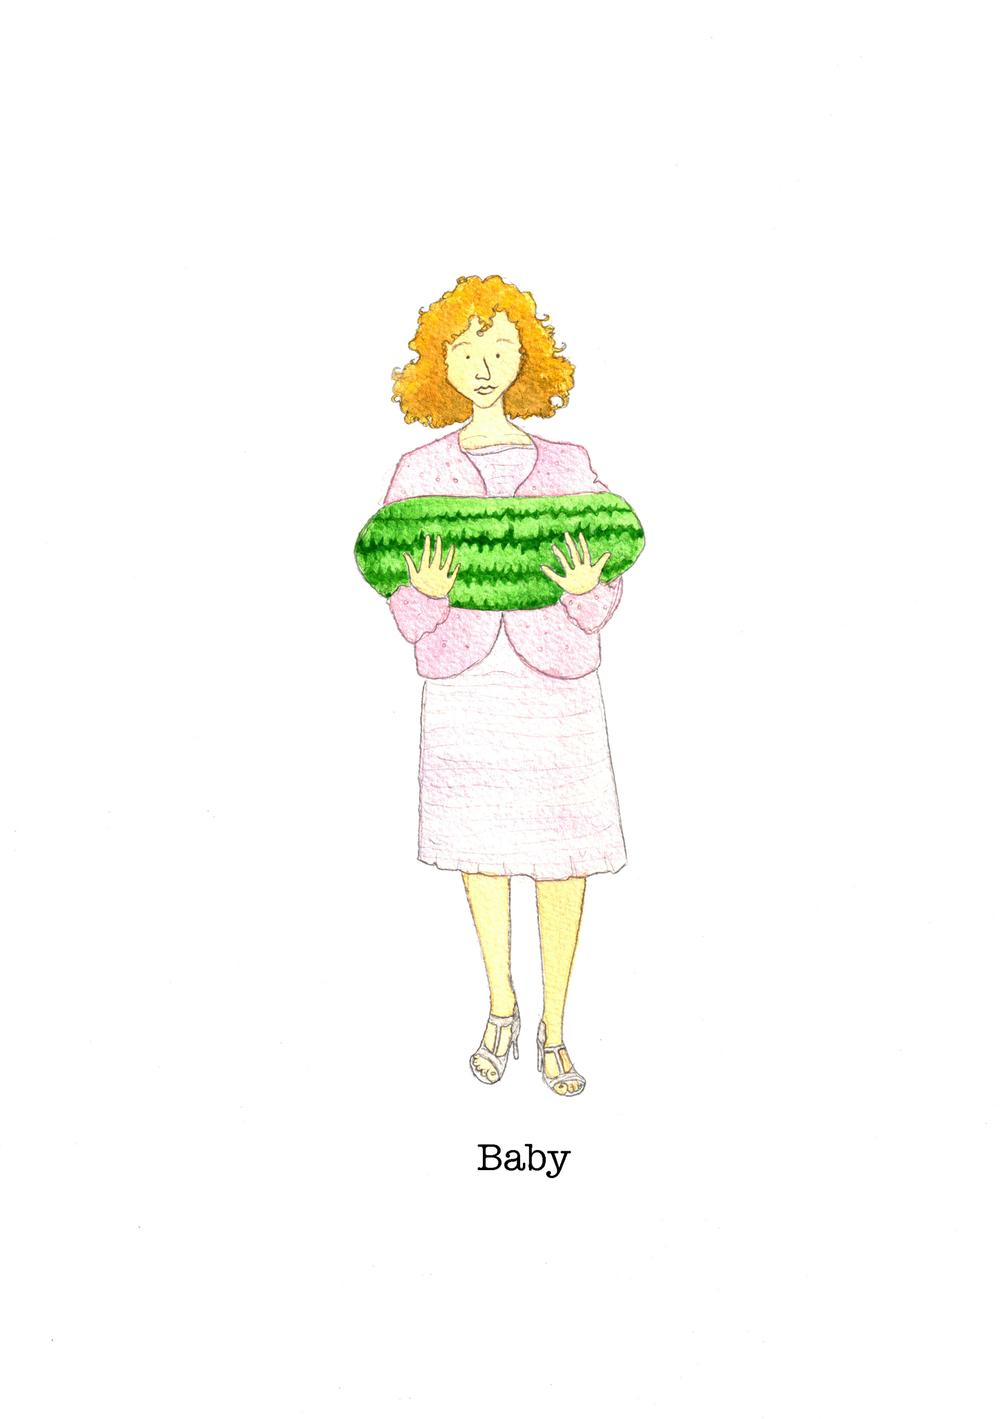 Baby copy.jpg